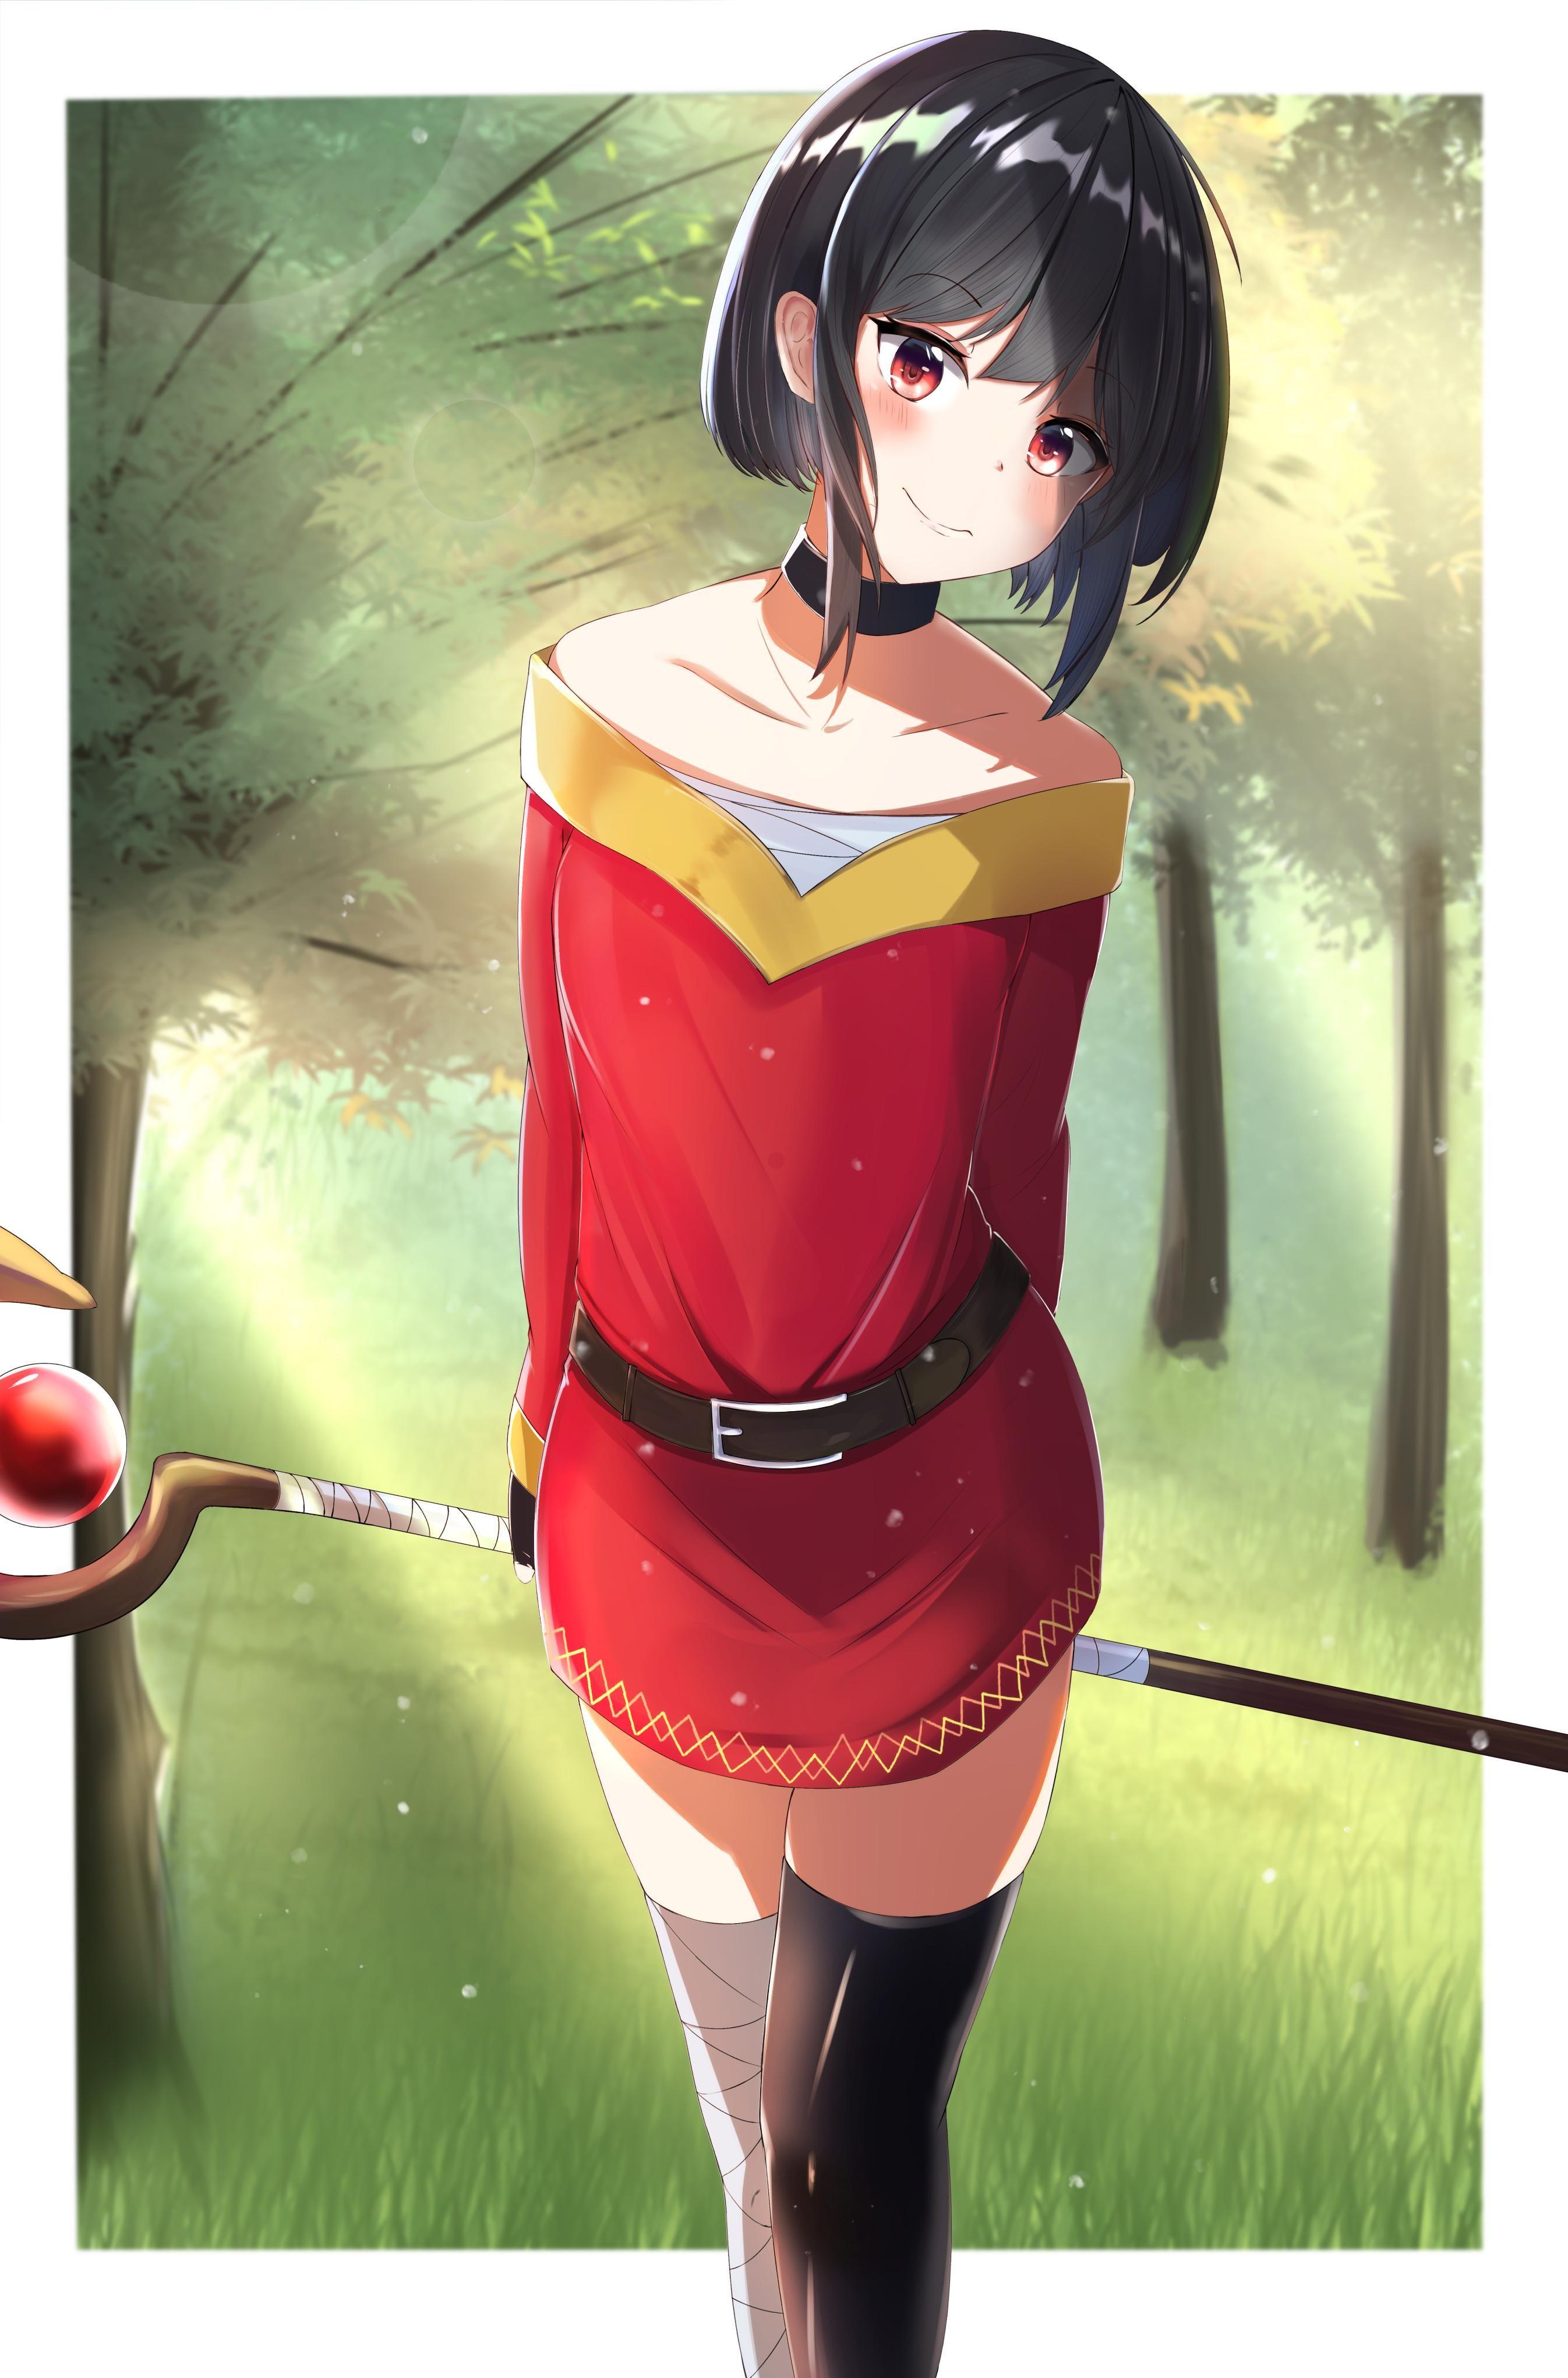 Pin on Anime girl hot